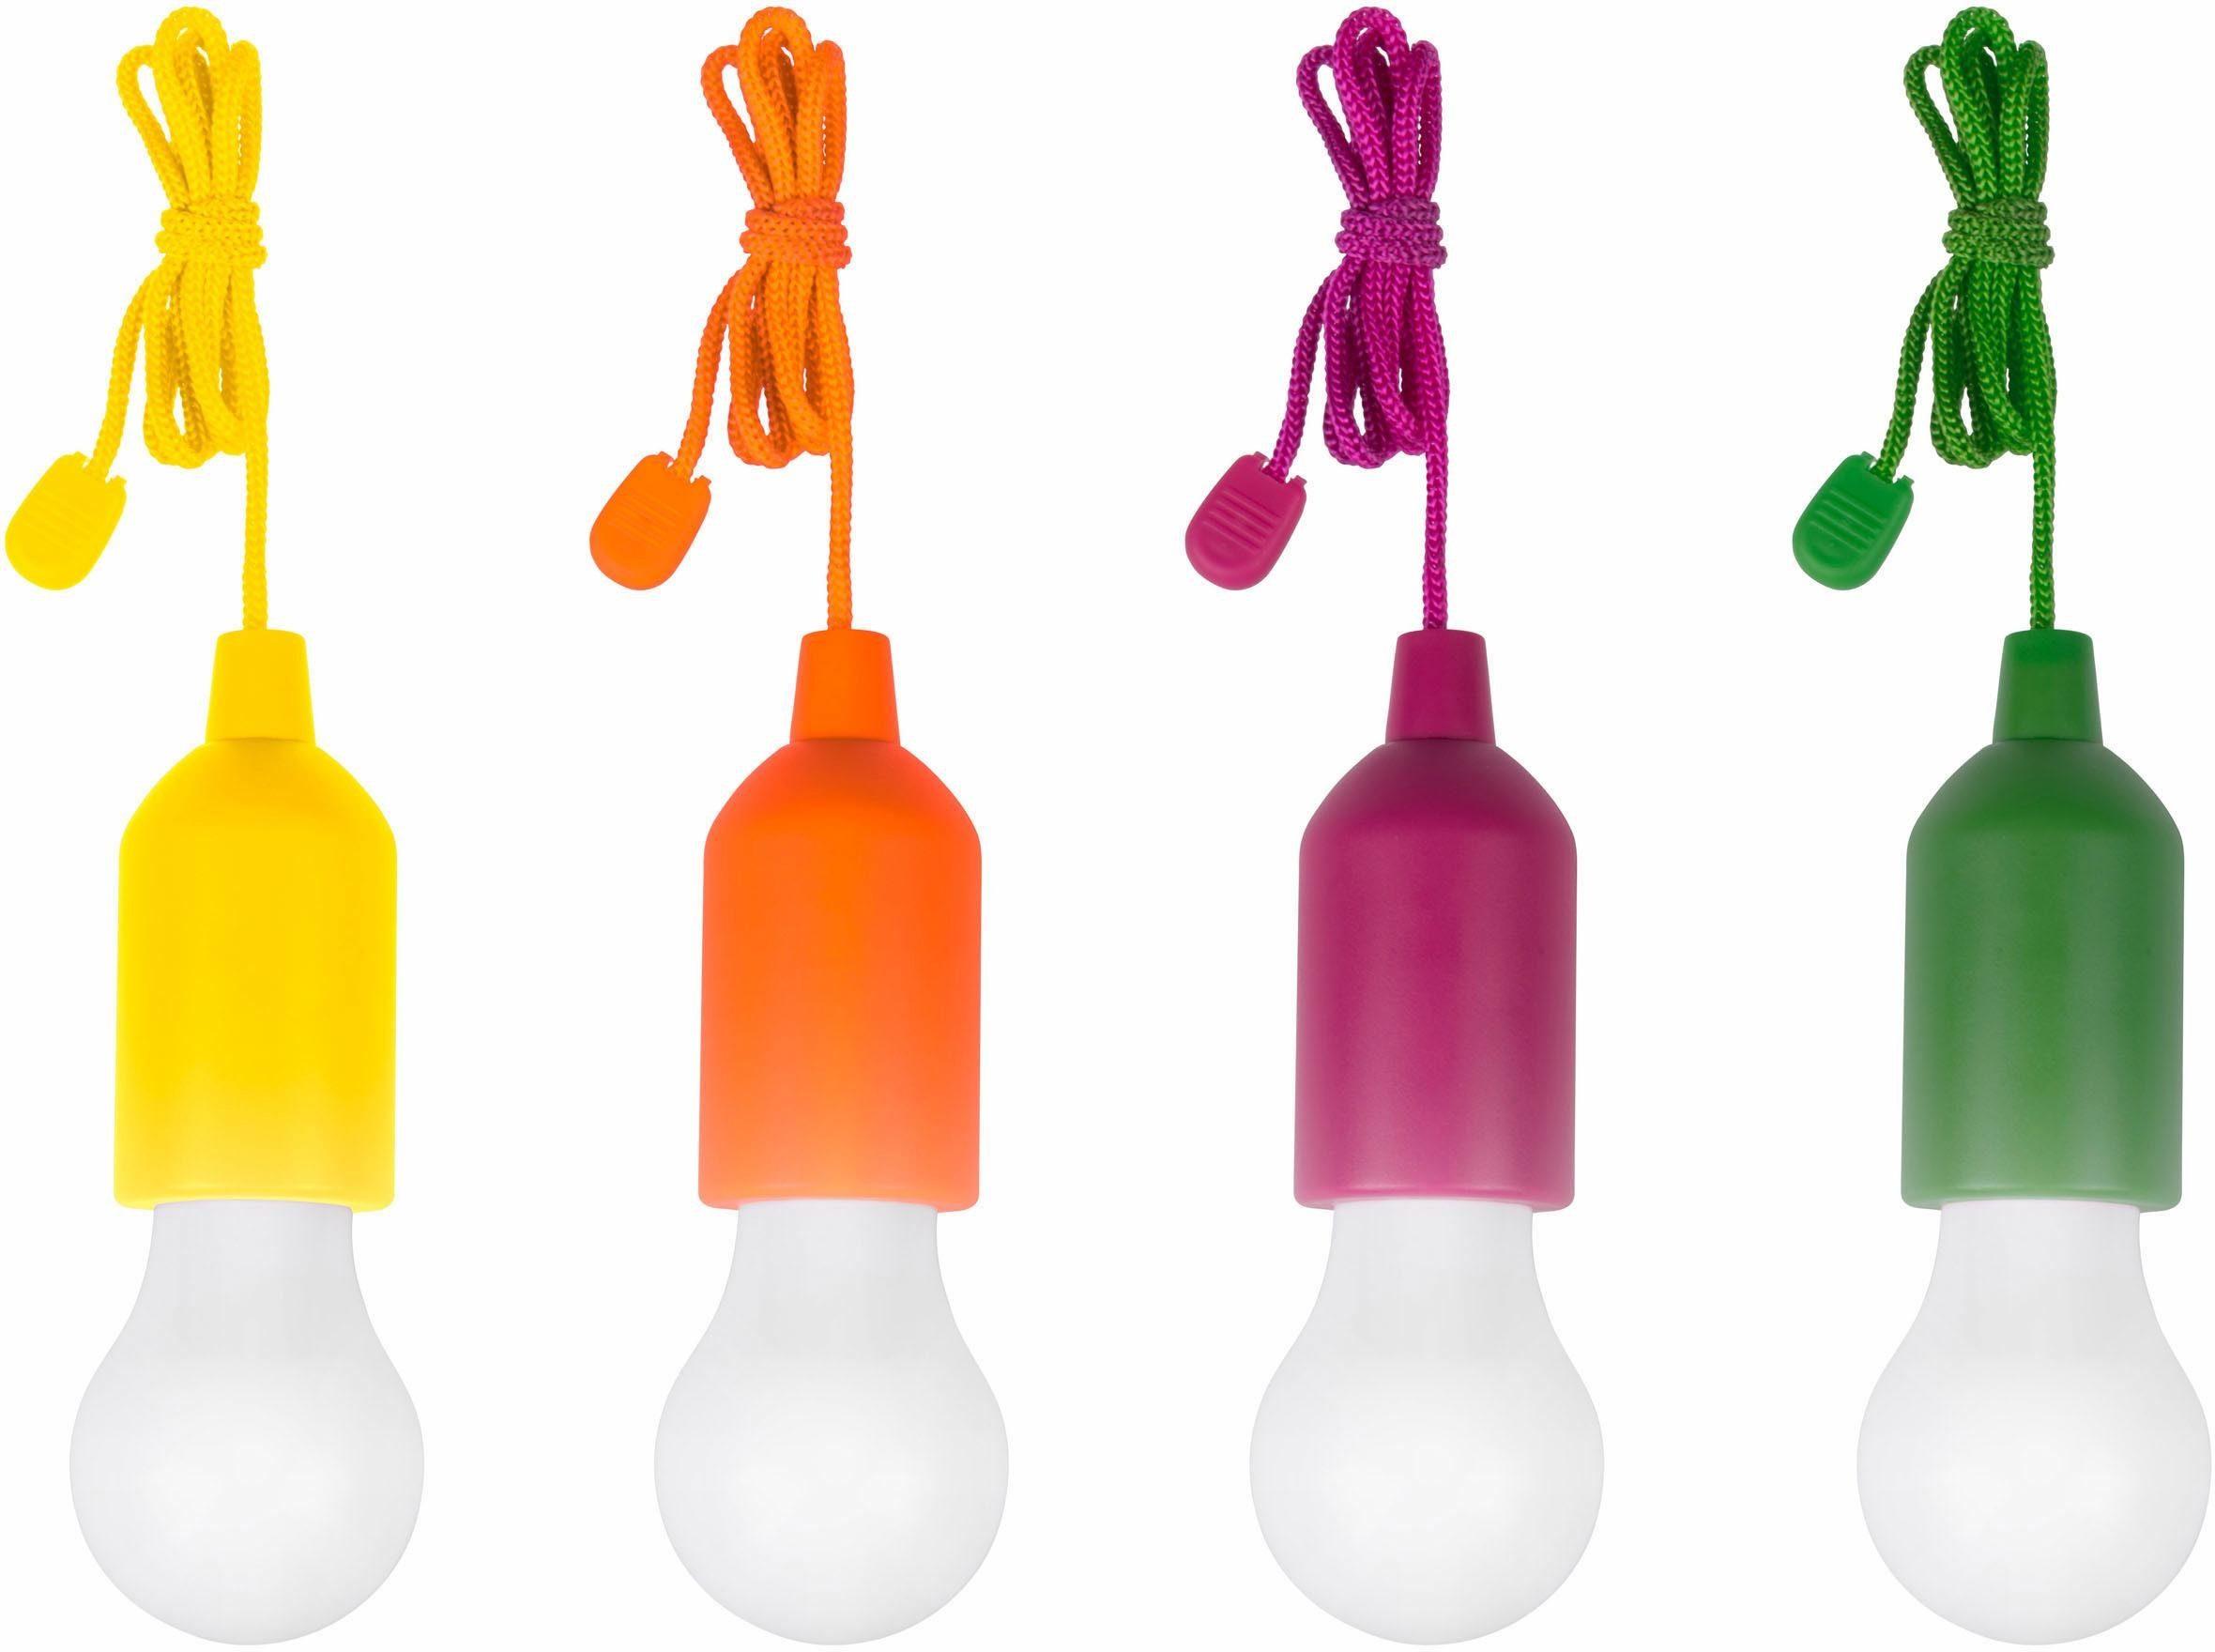 TV Werbung LED kabellose Allzweckleuchte, 4er-Set, »HandyLUXcolors «